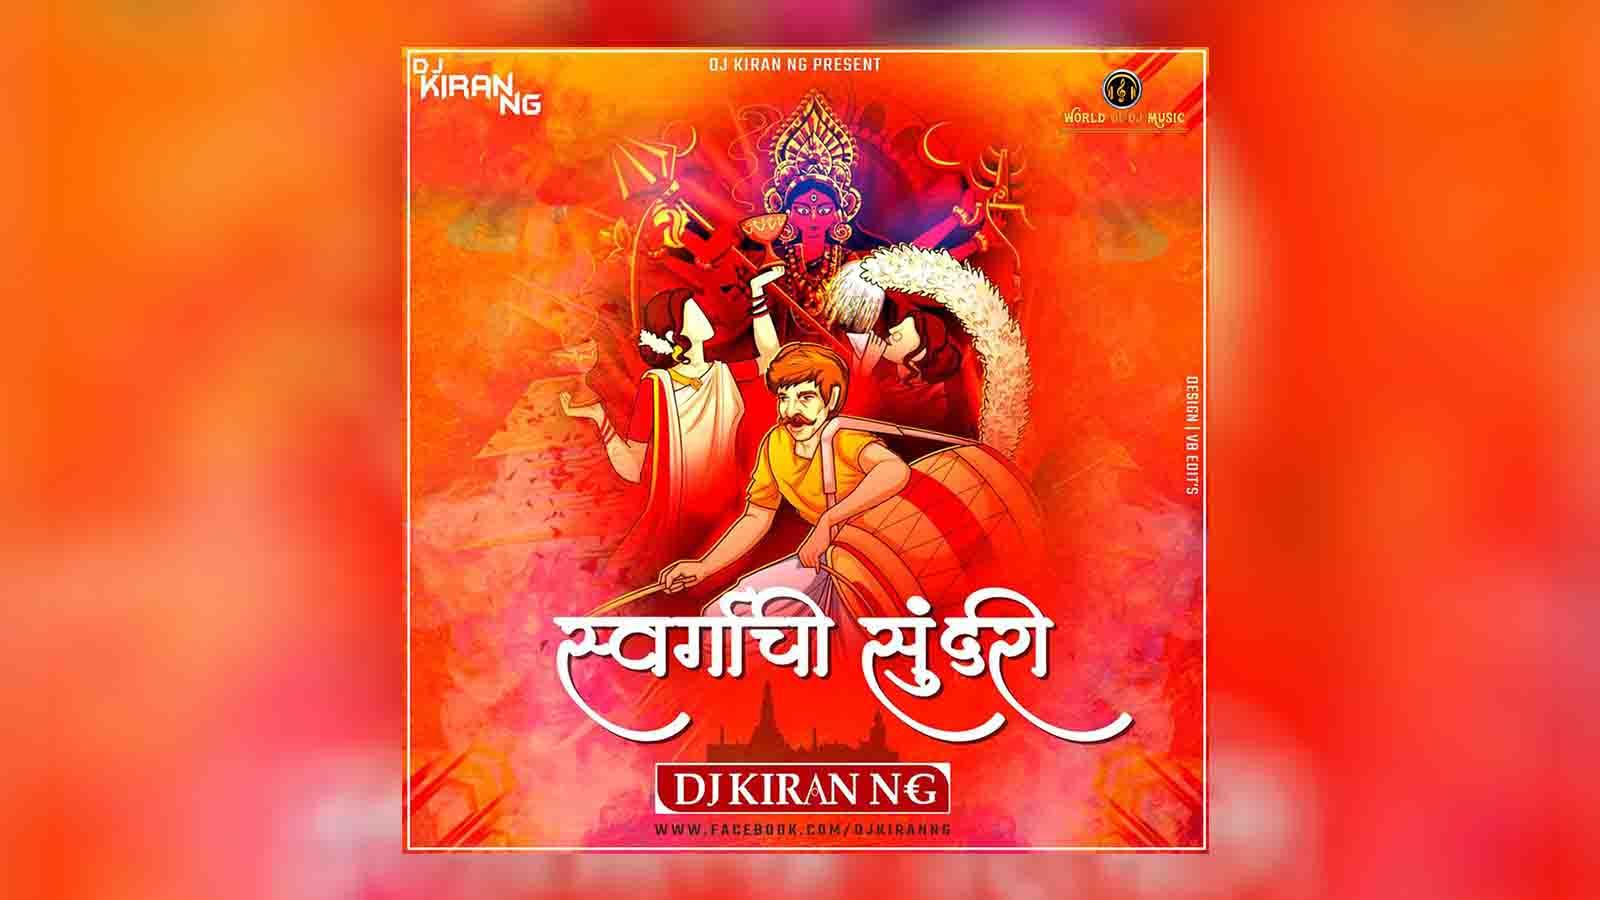 Swargachi Sundari (Remix) - Dj Kiran (NG)